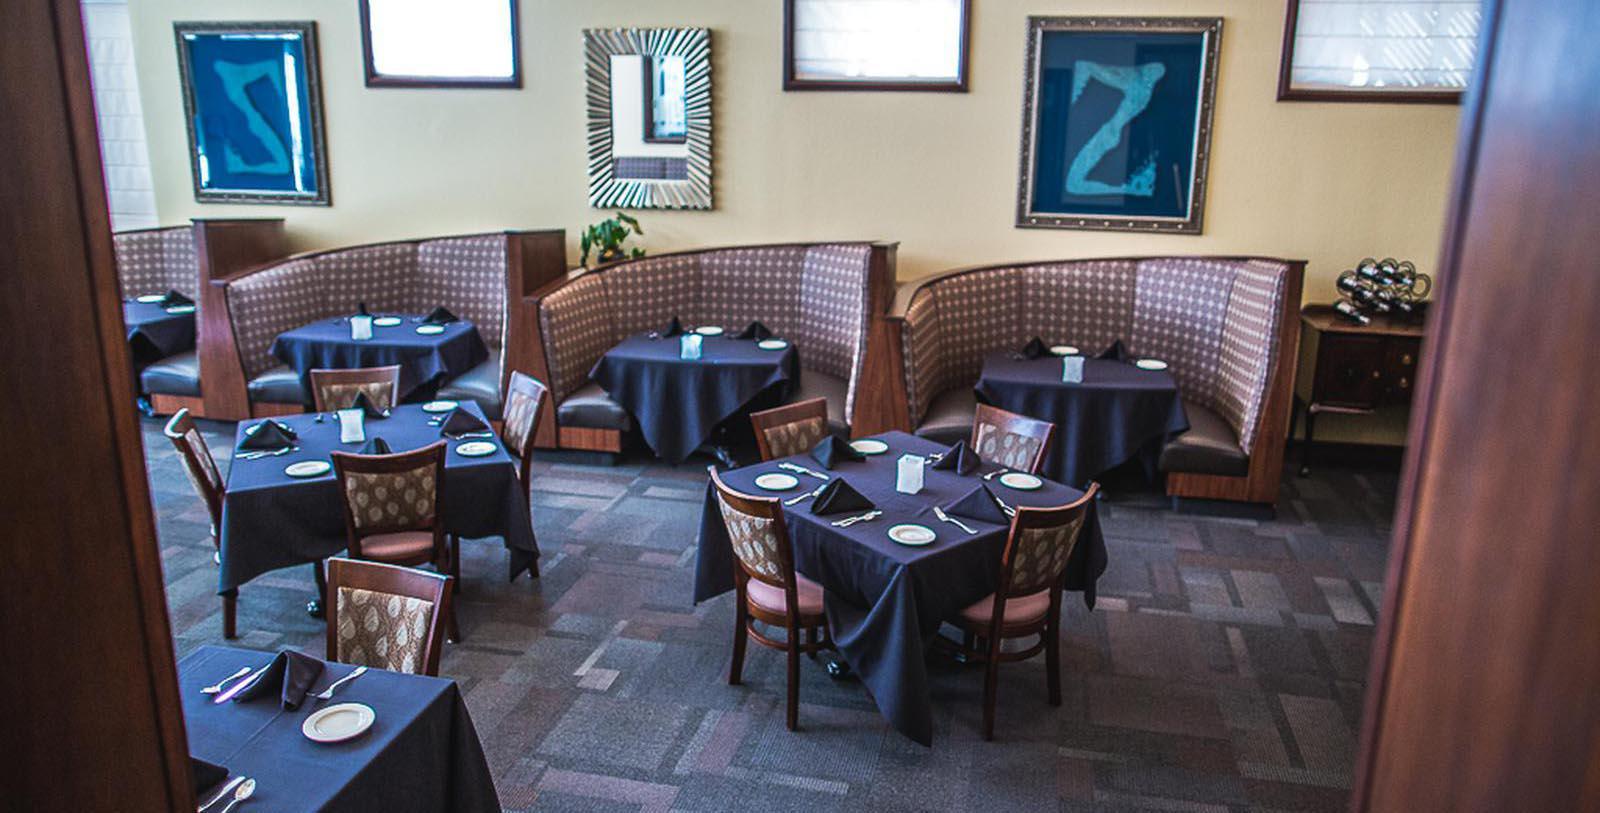 Image of Peacock dining room Hassayampa Inn, 1927, Member of Historic Hotels of America, in Prescott, Arizona, Taste